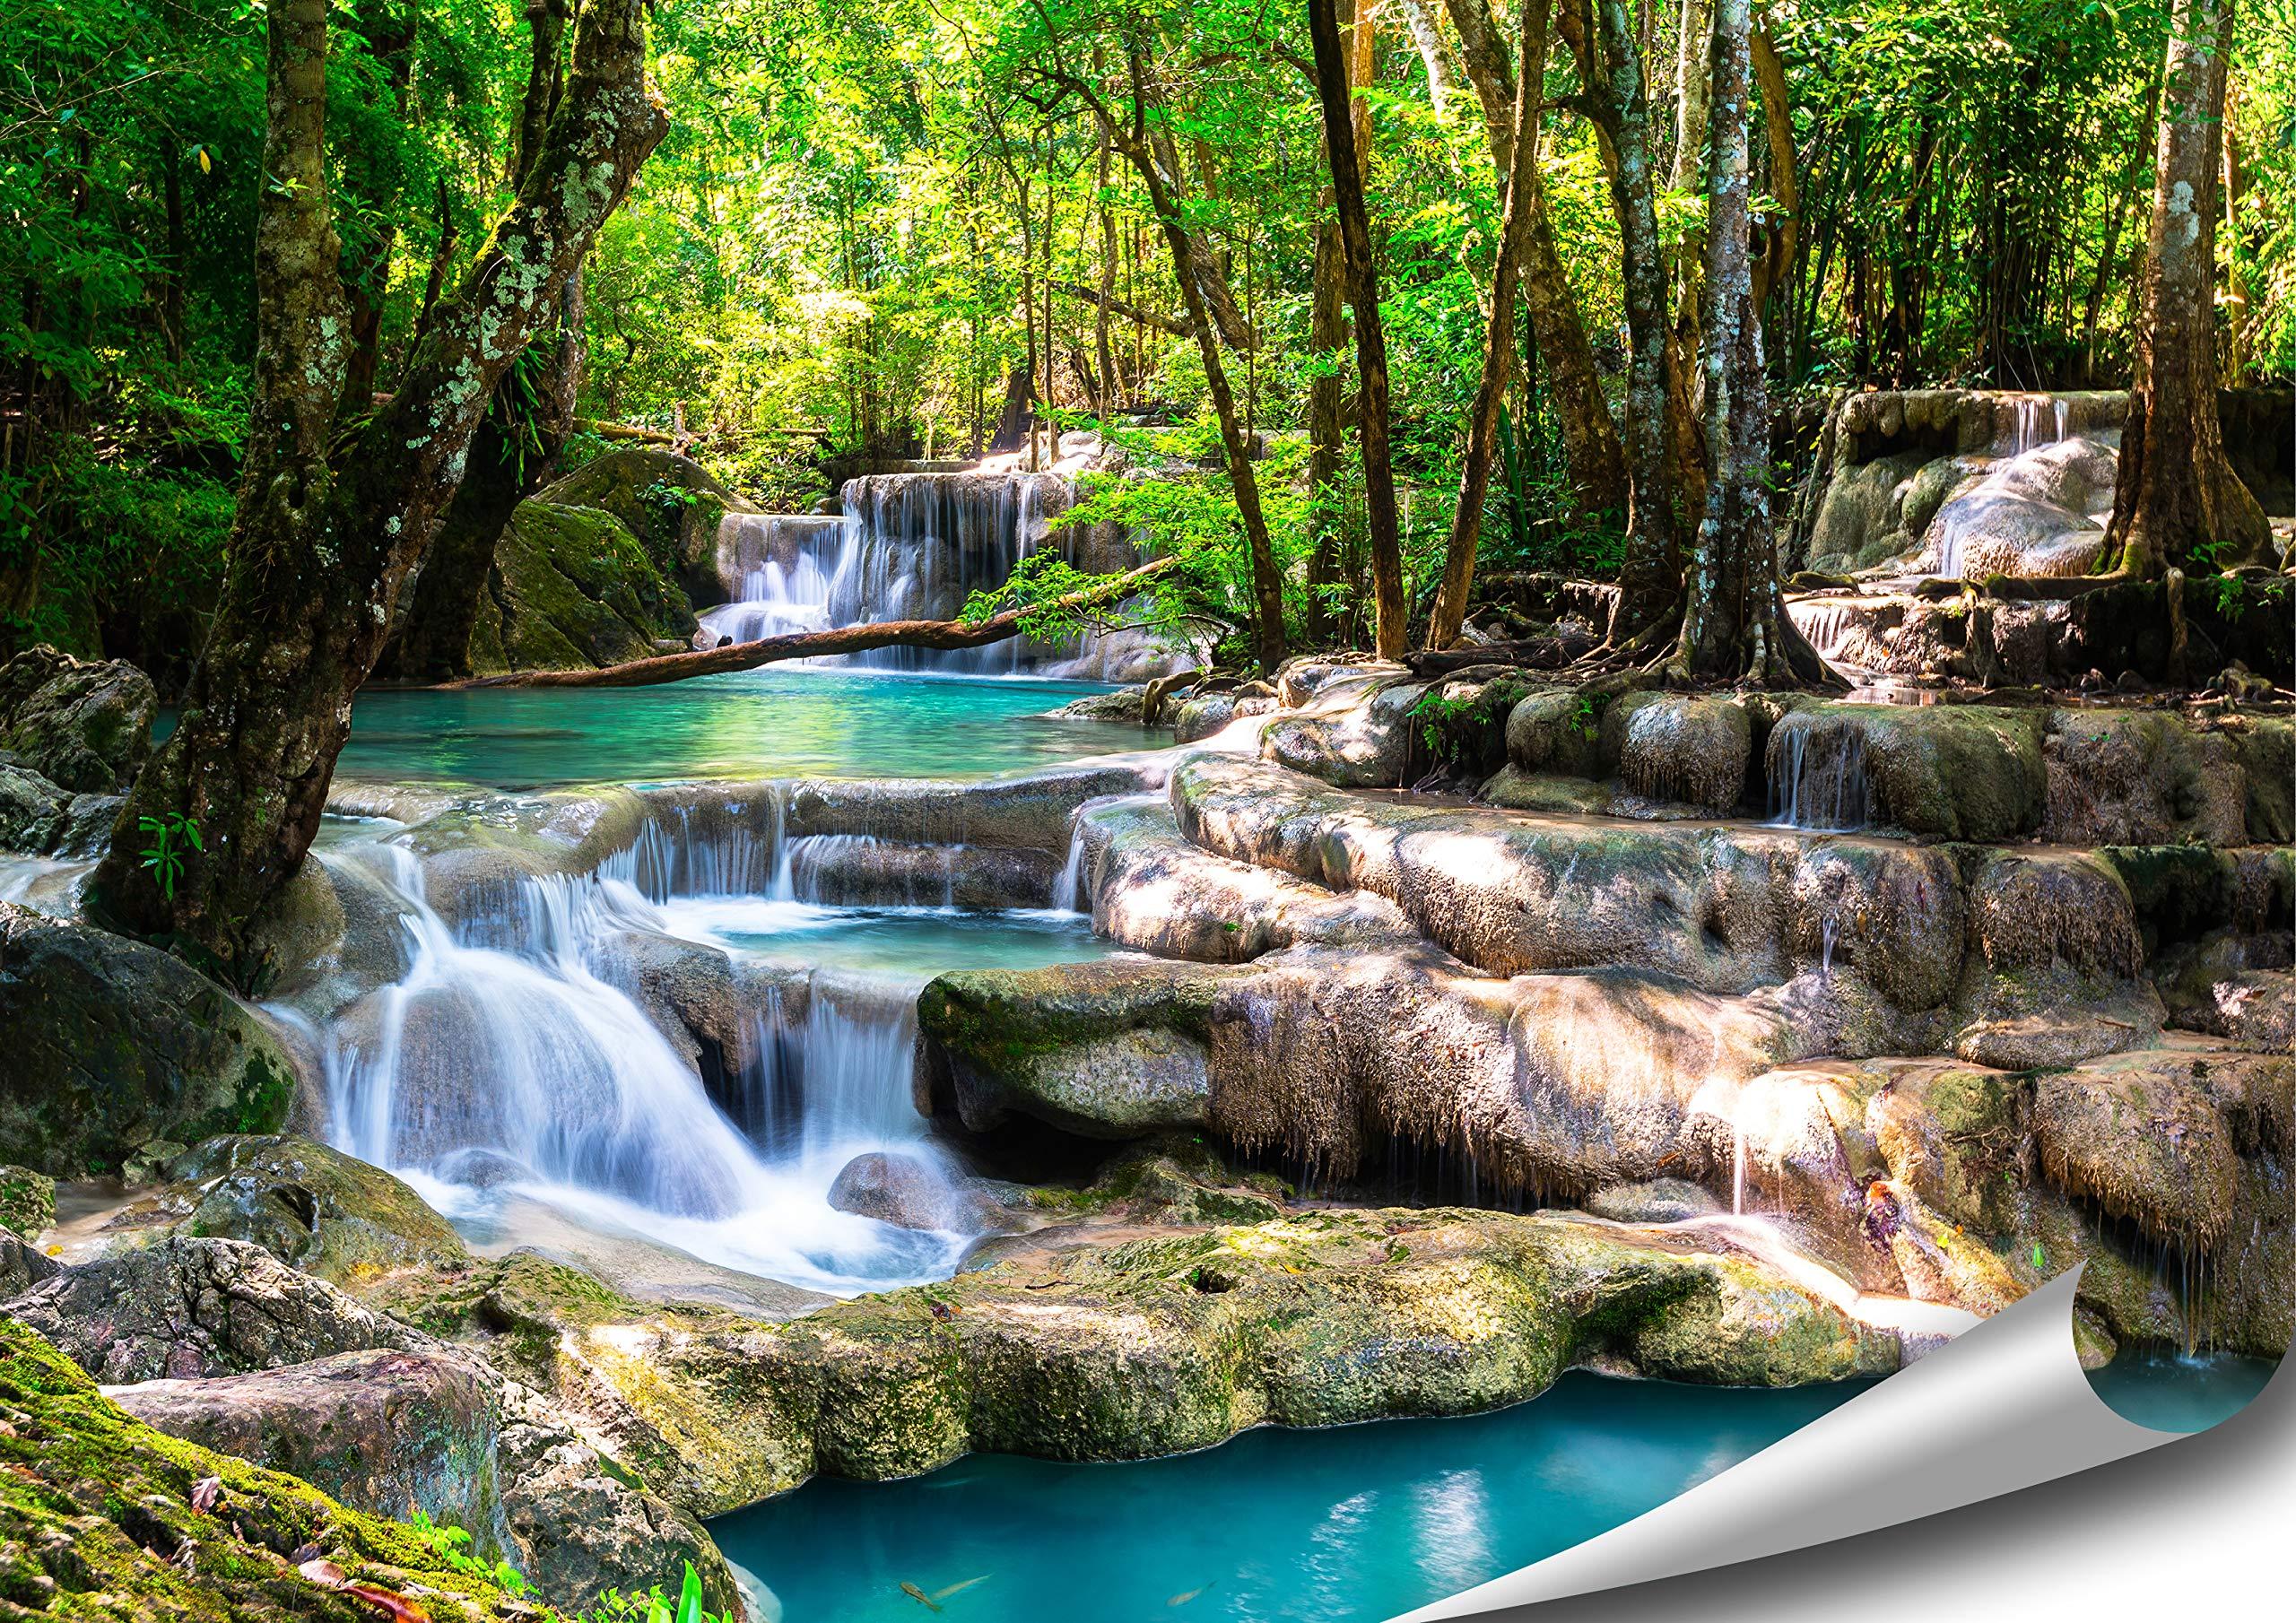 ARTBAY Cascada Tropical en el Bosque - Póster XXL - 118,8 x 84 cm   Cascada mágica en un Bosque inundado por el Sol, Tailandia   Póster de Naturaleza: Amazon.es: Hogar